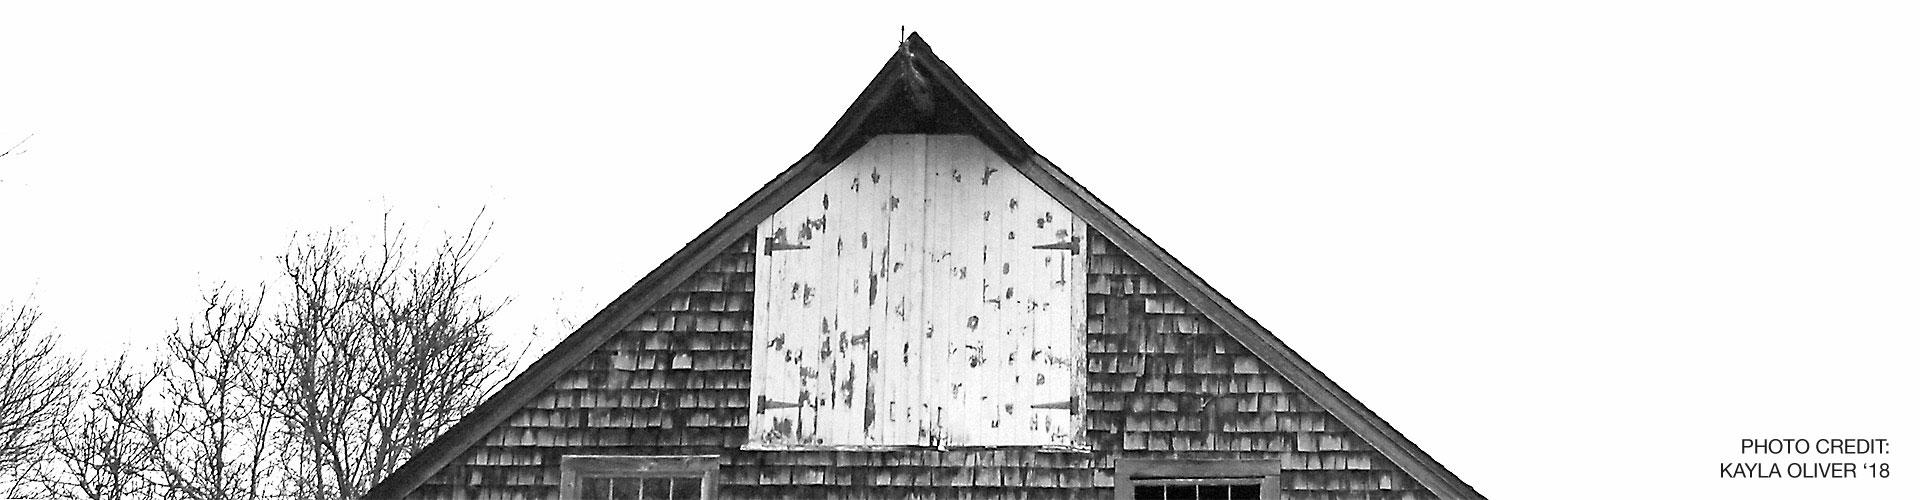 B&W Barn Roof